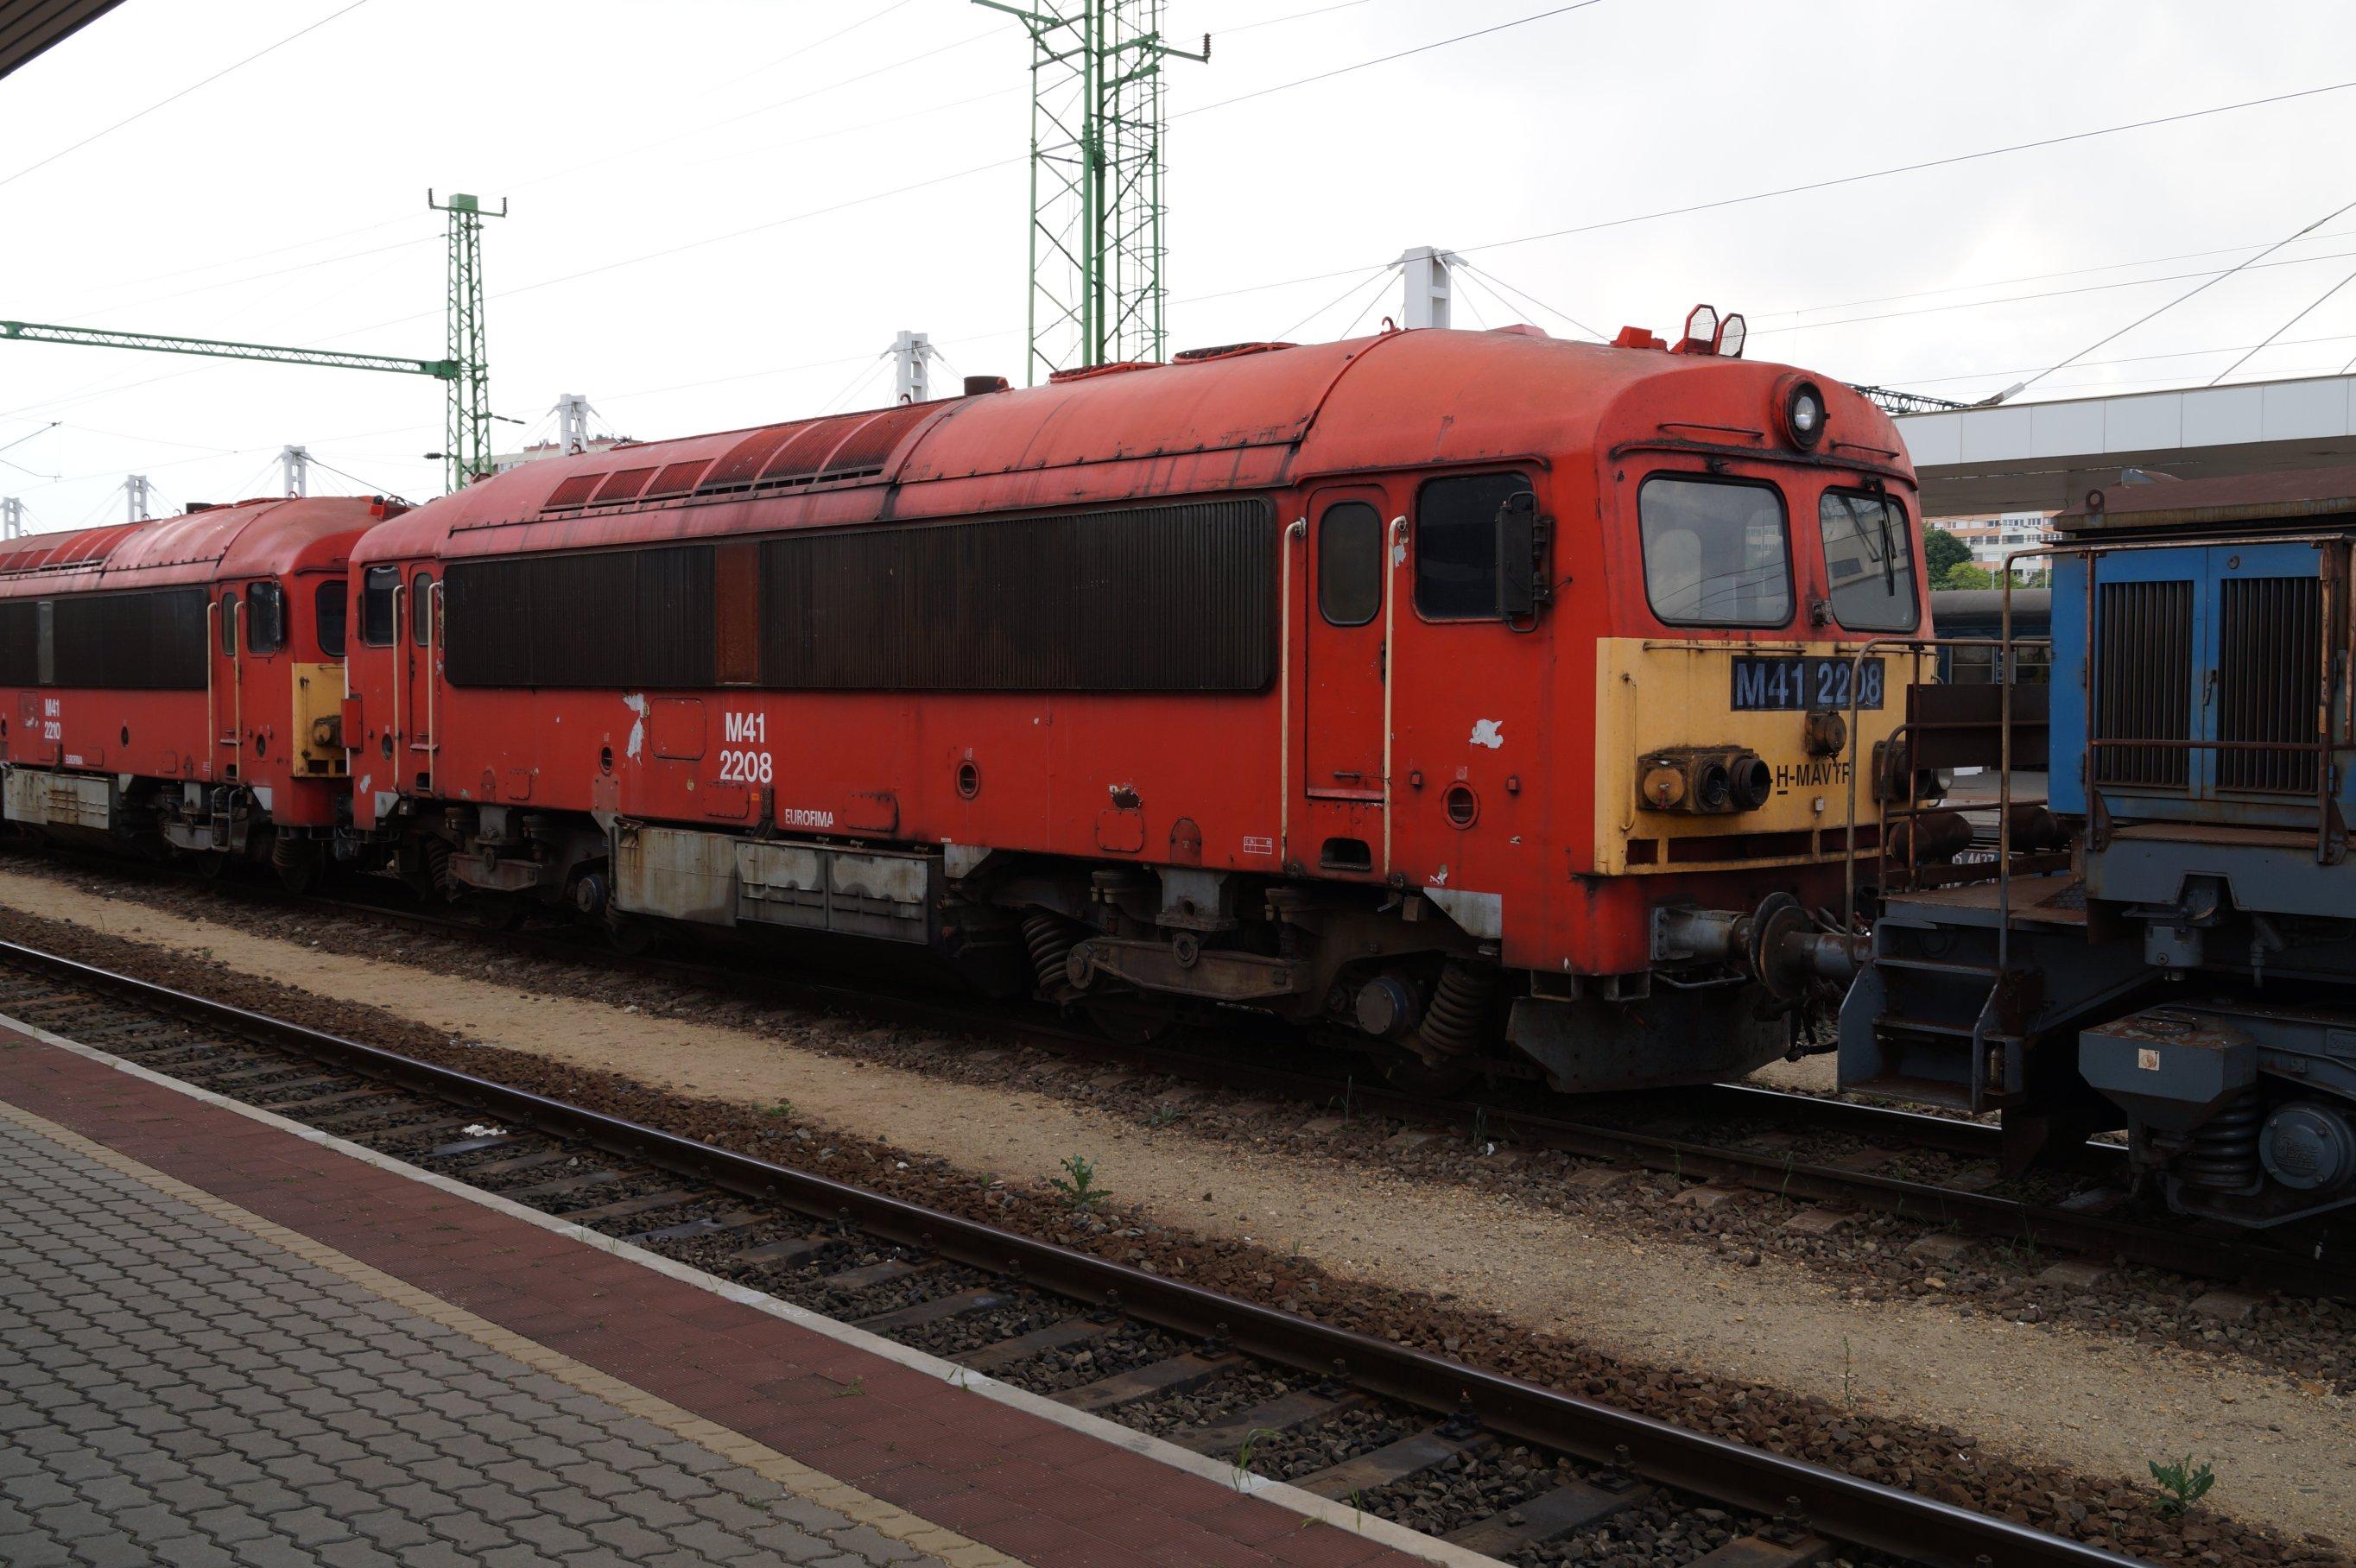 m41-2208.jpg